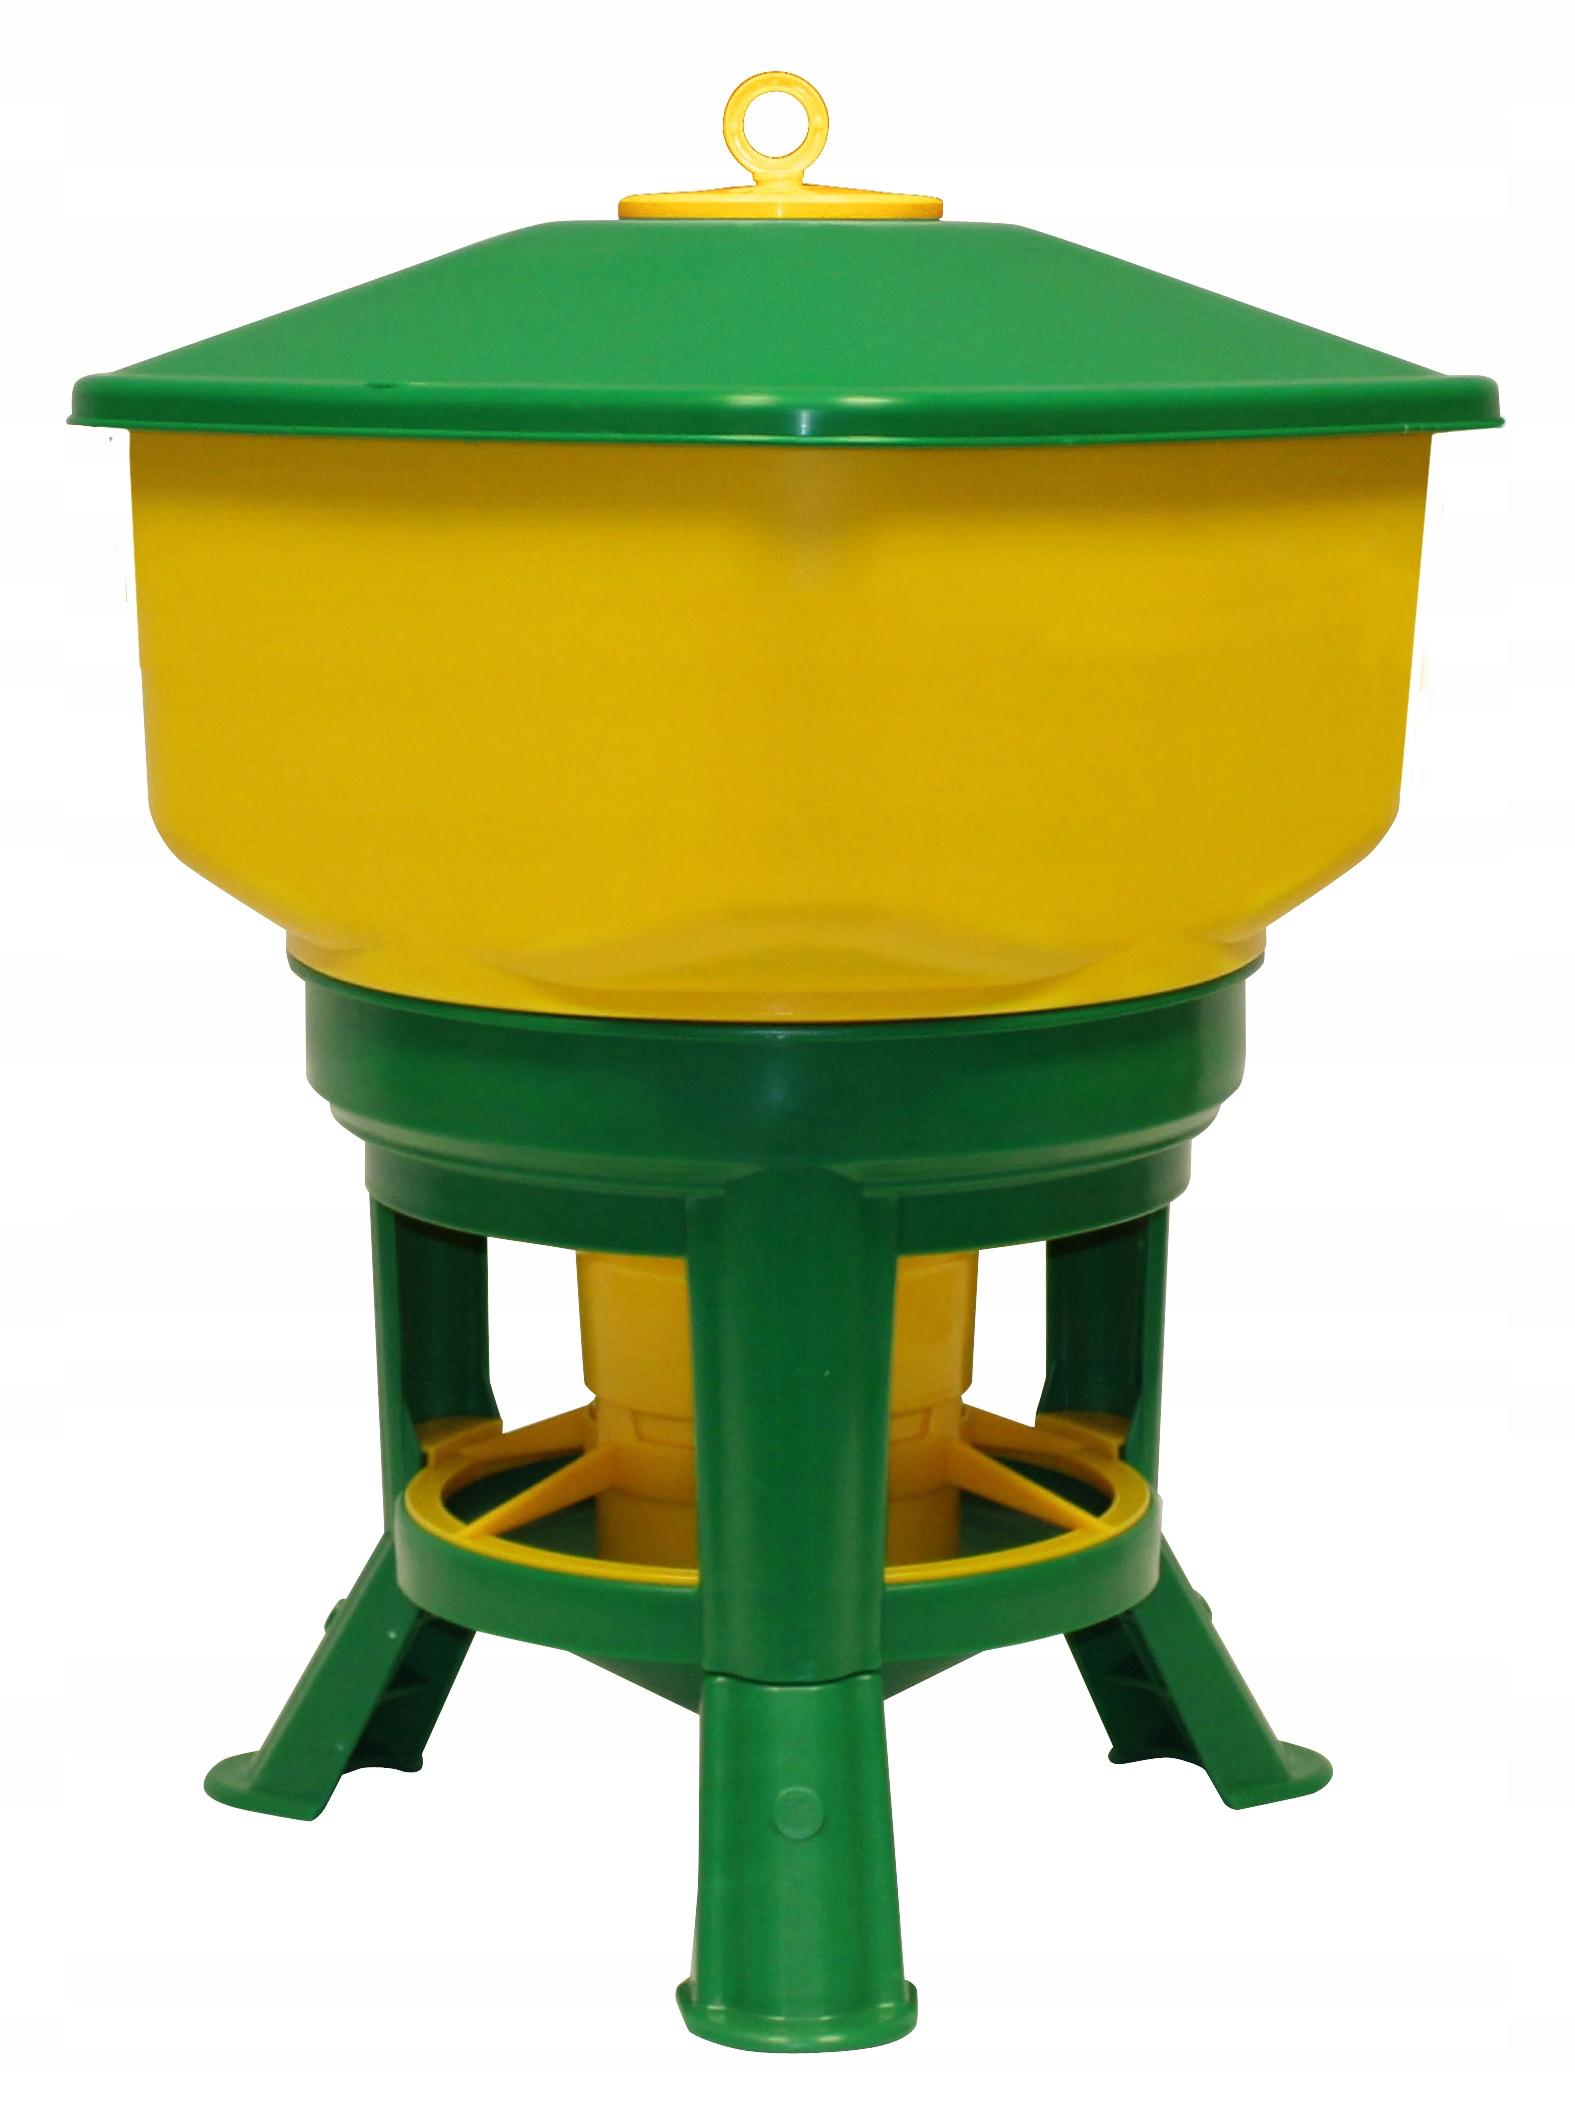 Лоток автоматического 30L для домашней птицы кур Novital